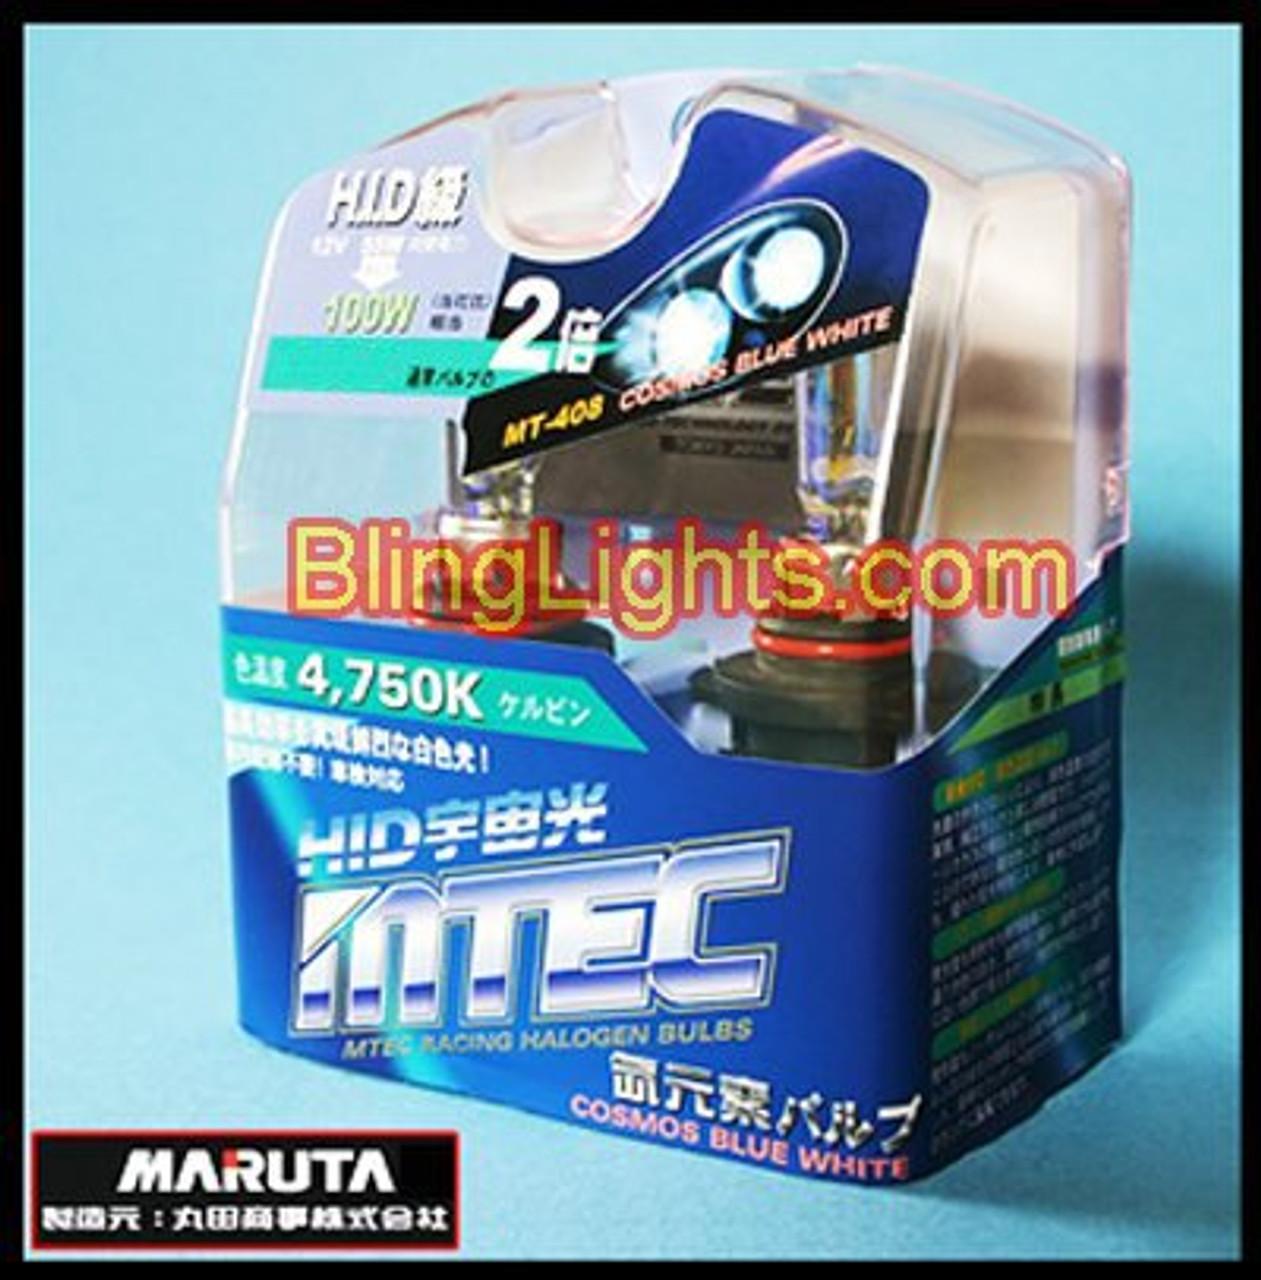 1993-2000 Mercedes C-Class W202 Bright White Light Bulbs for Headlamps  Headlights Head Lamps Lights